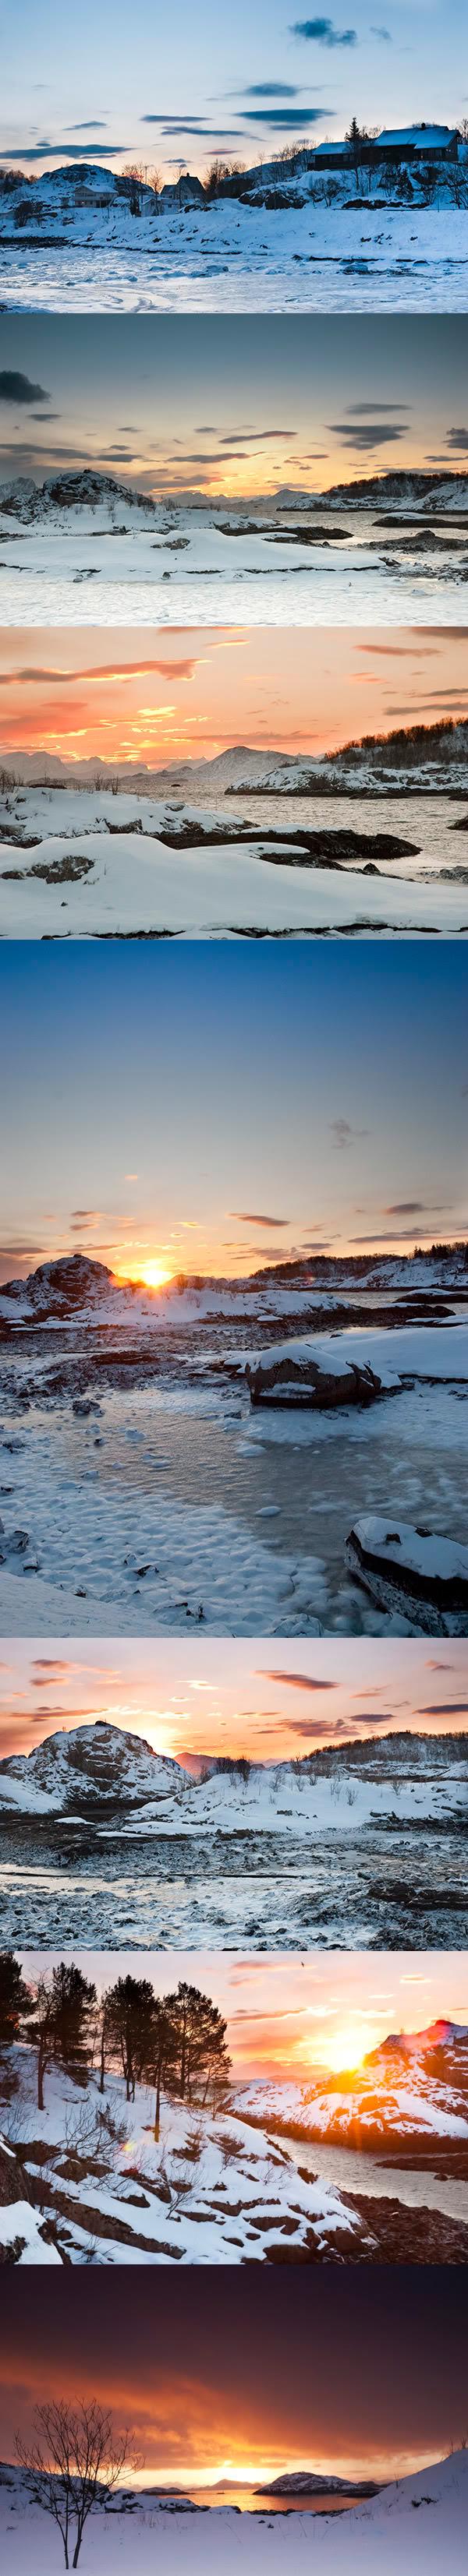 wschod, sunrise